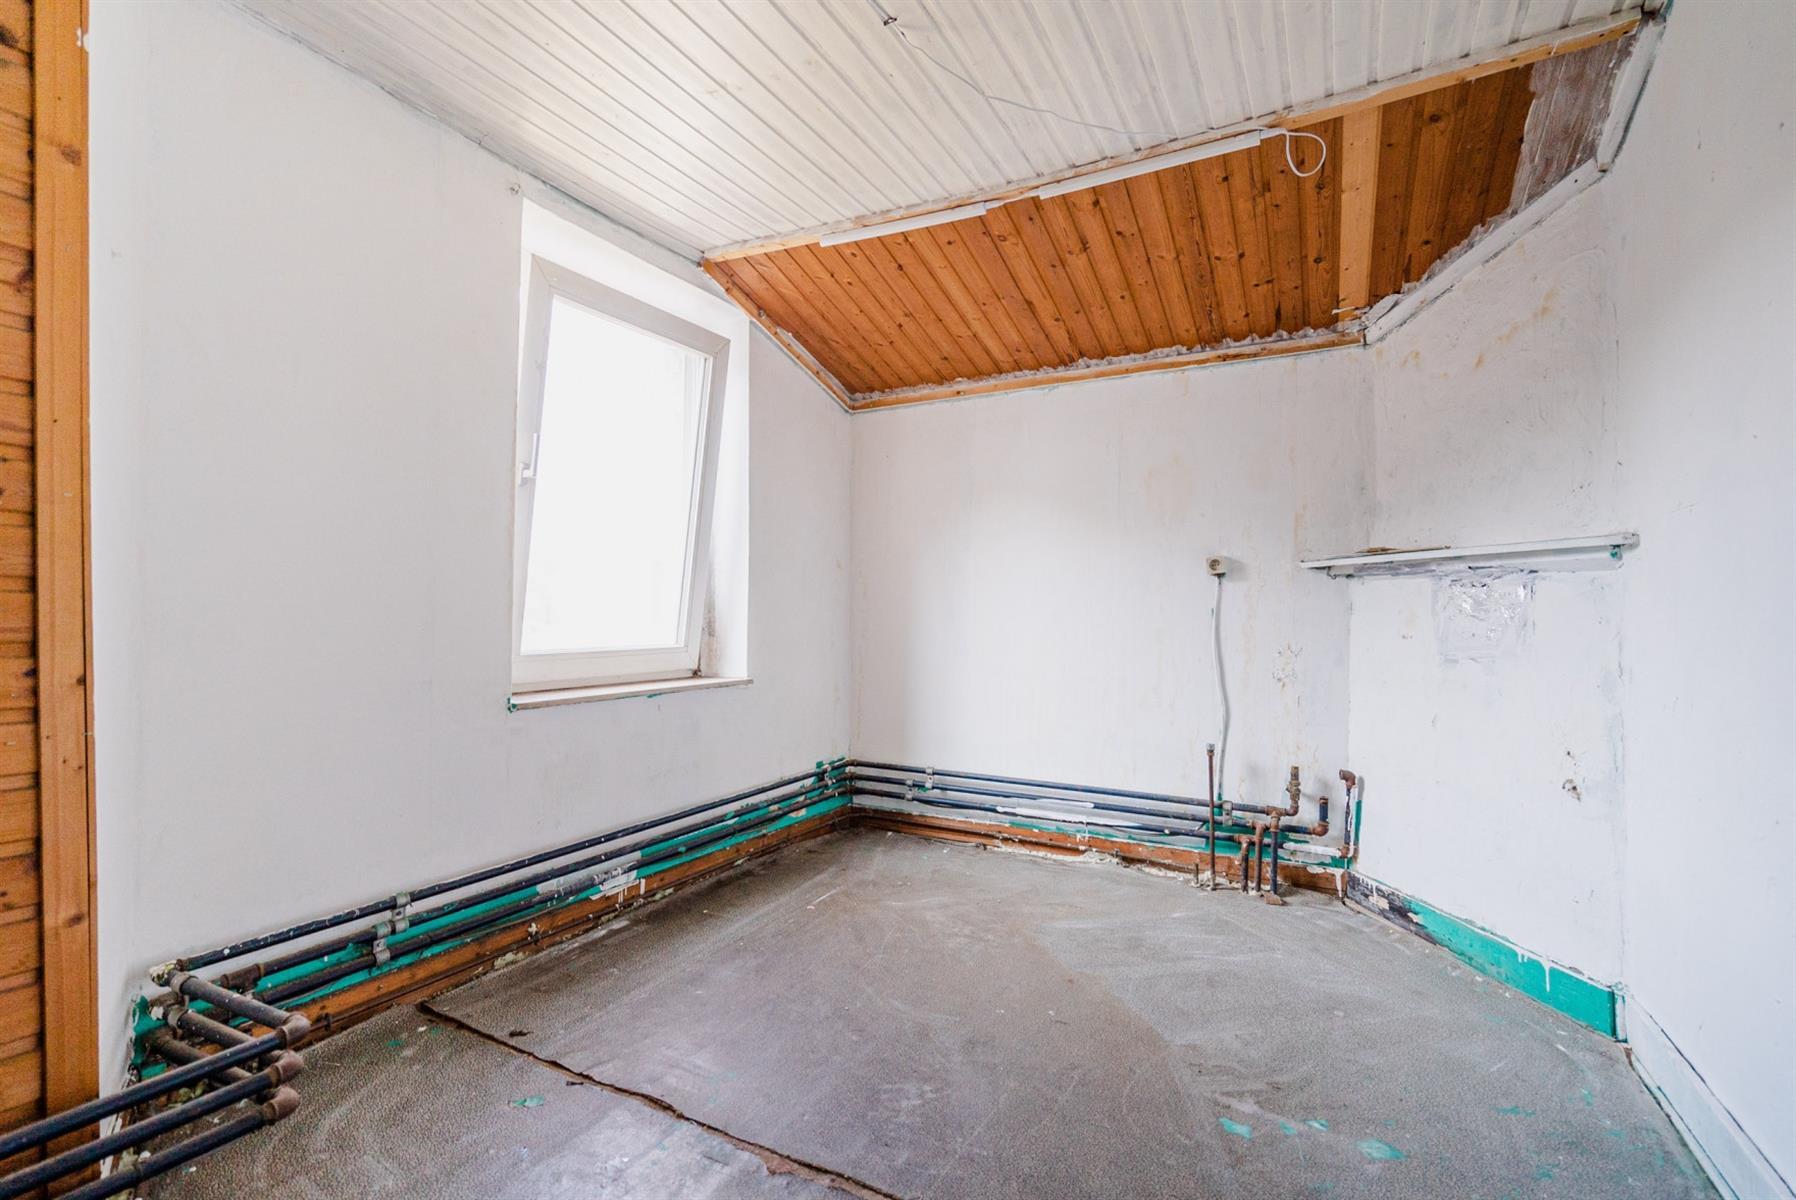 Maison - Oupeye Hermallesous-Argenteau - #4324098-11